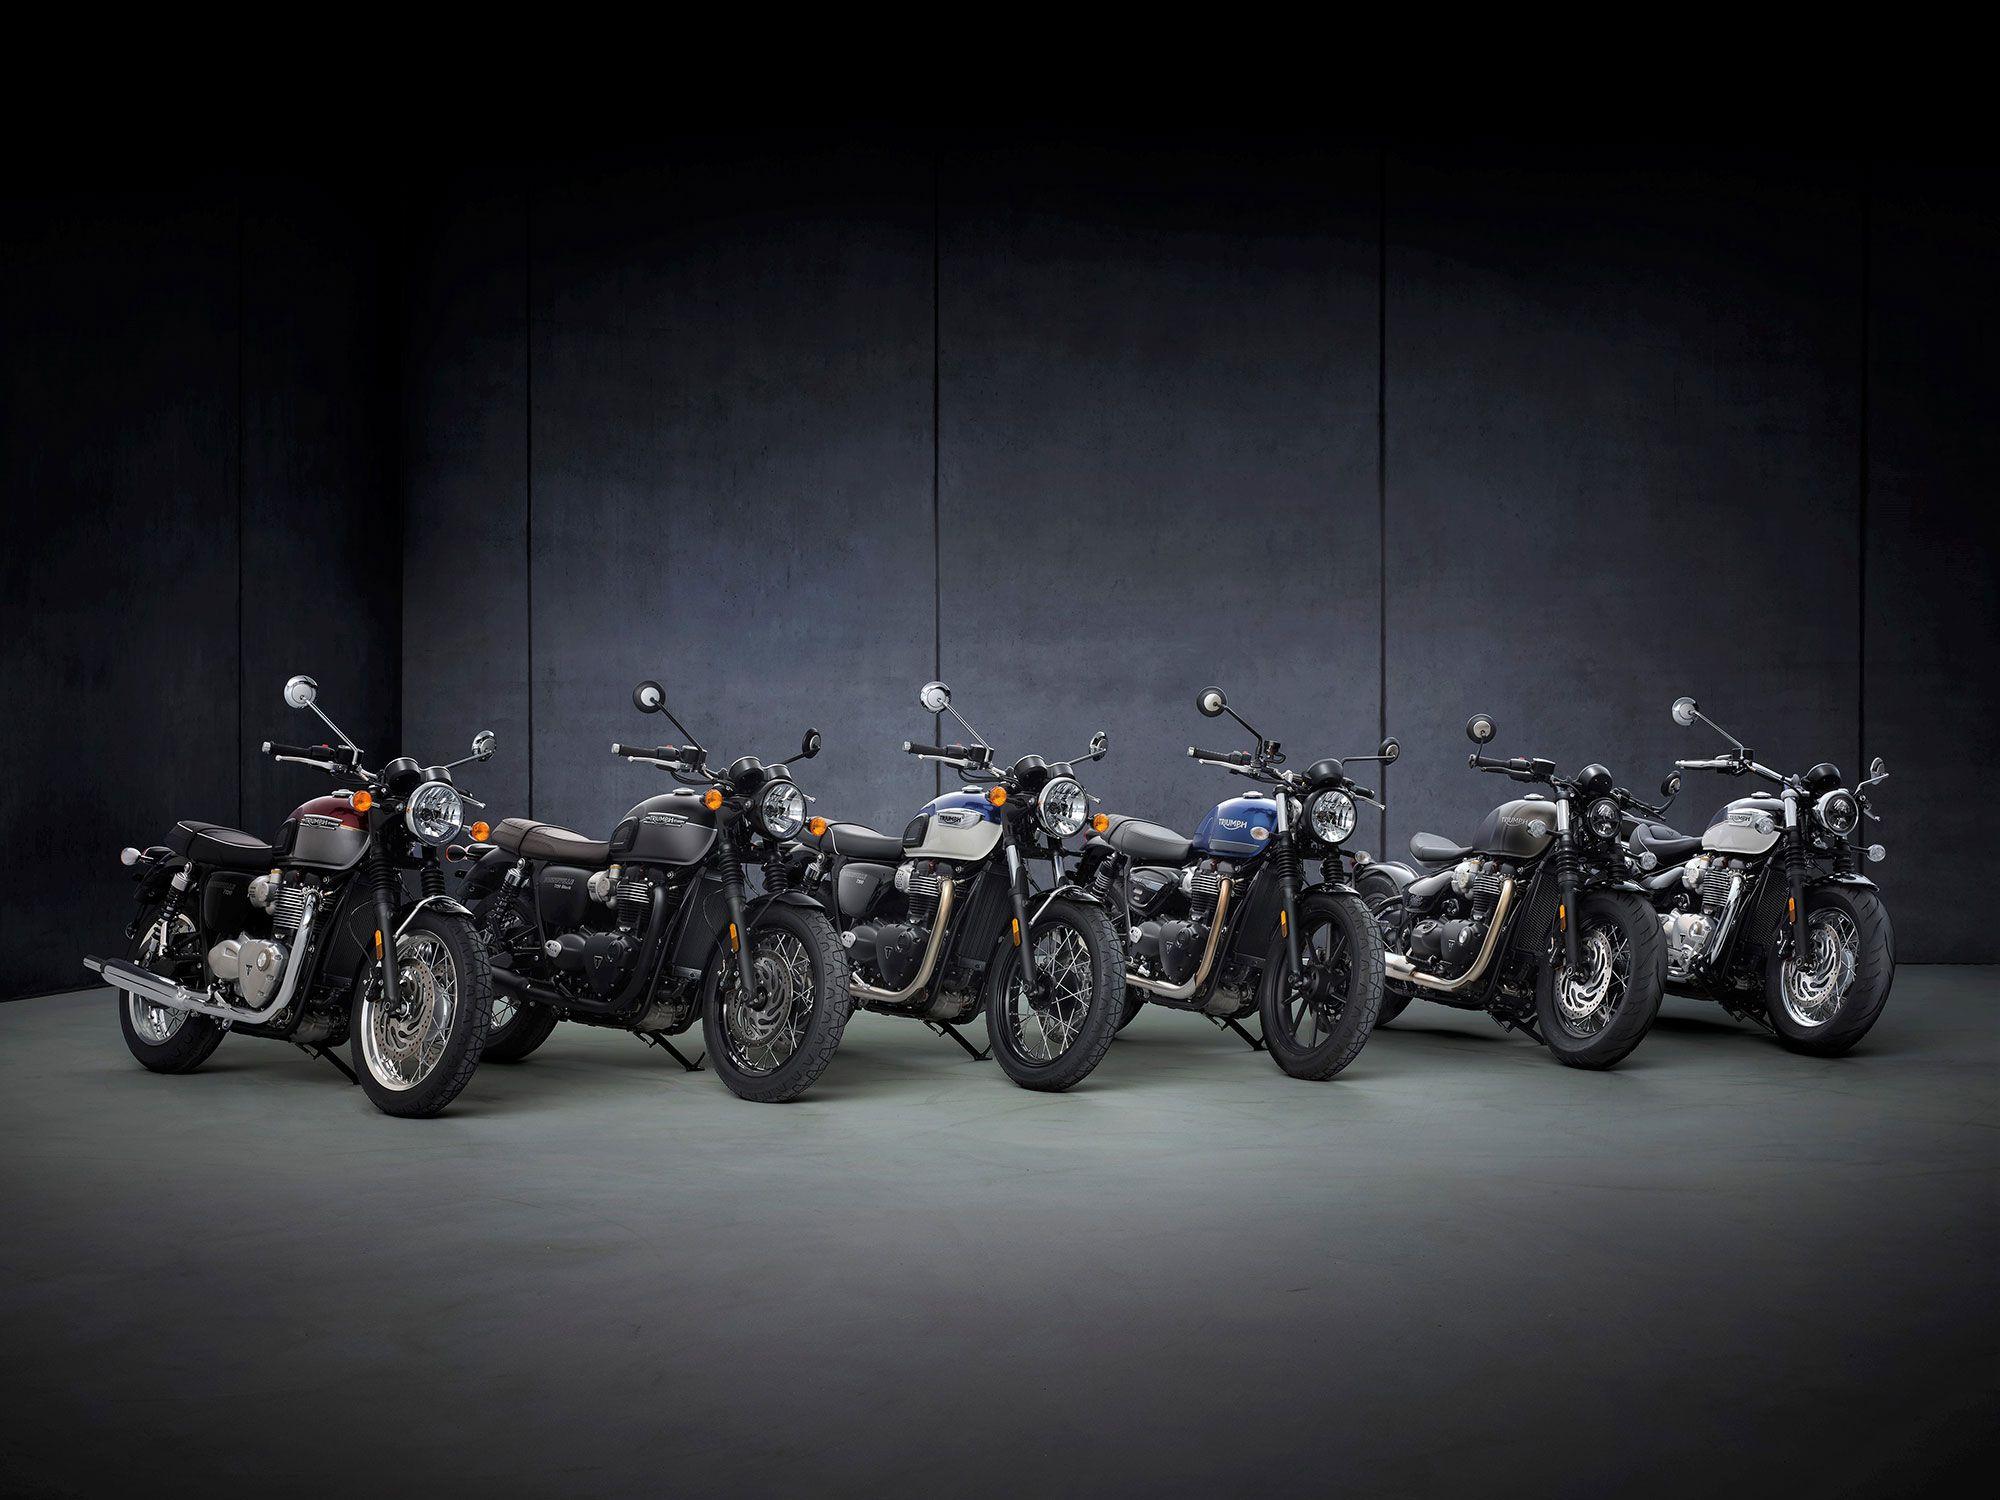 Triumph Bonneville Series Updated for 2022